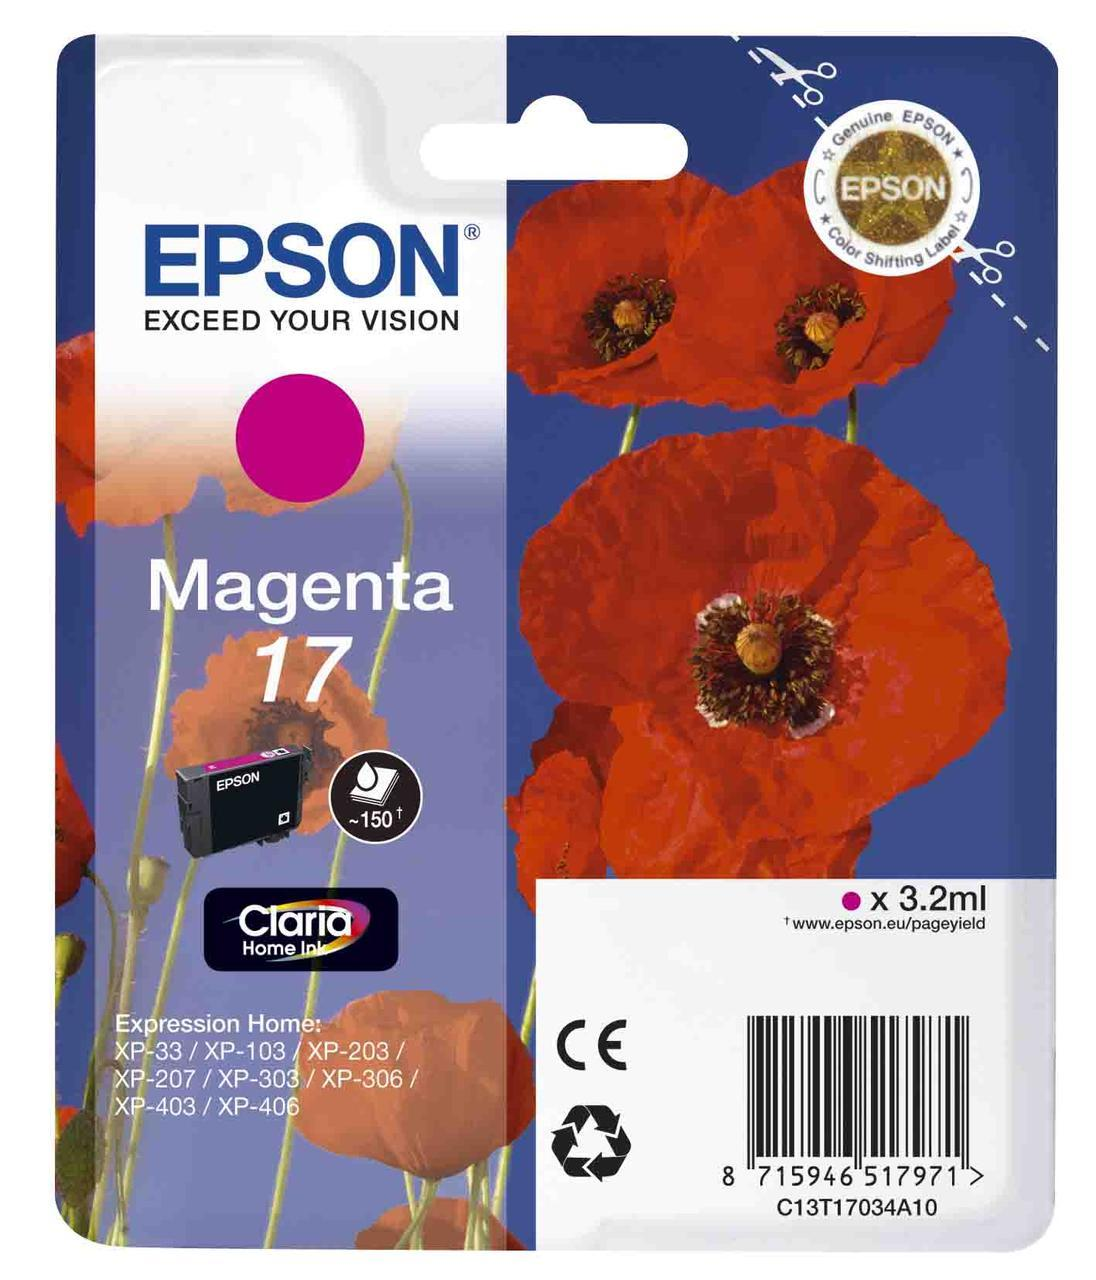 Картридж Epson C13T17034A10 (№17), Объем: 3,2 мл, Копий ( ISO 19752): 150, Цвет: Пурпурный, Совместимость: Exp